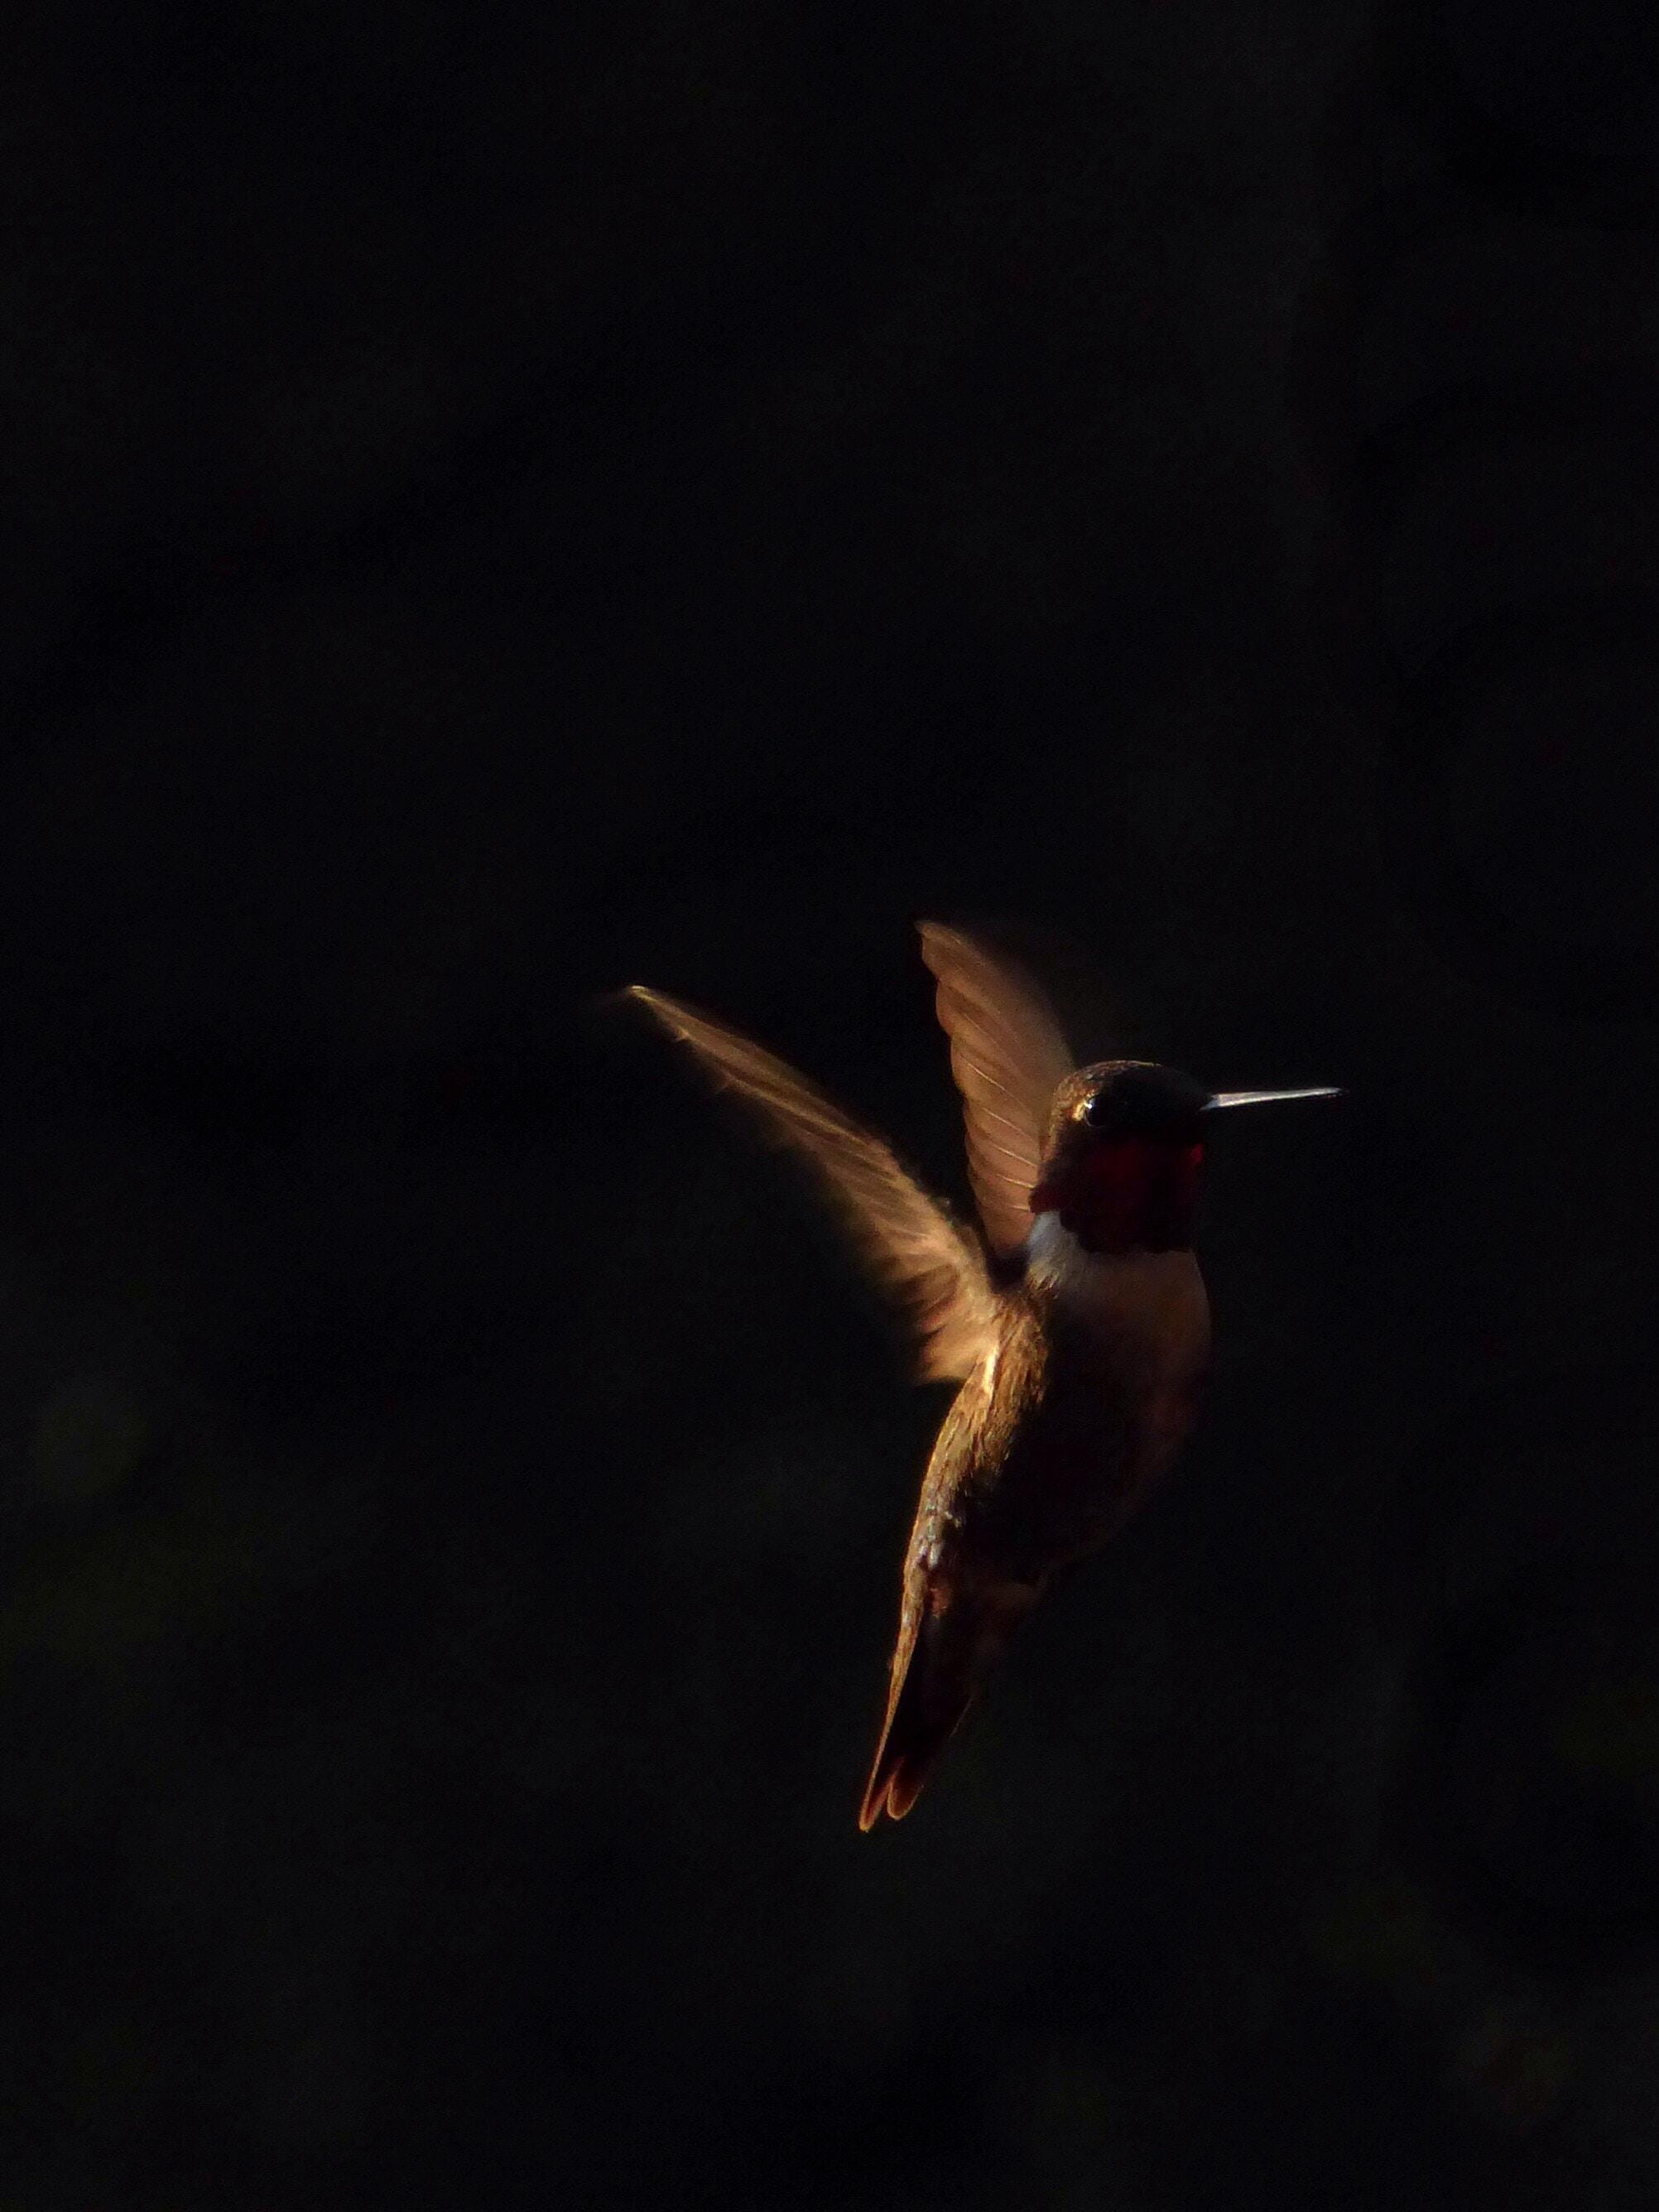 Portrait of a hummingbird in flight against a dark background